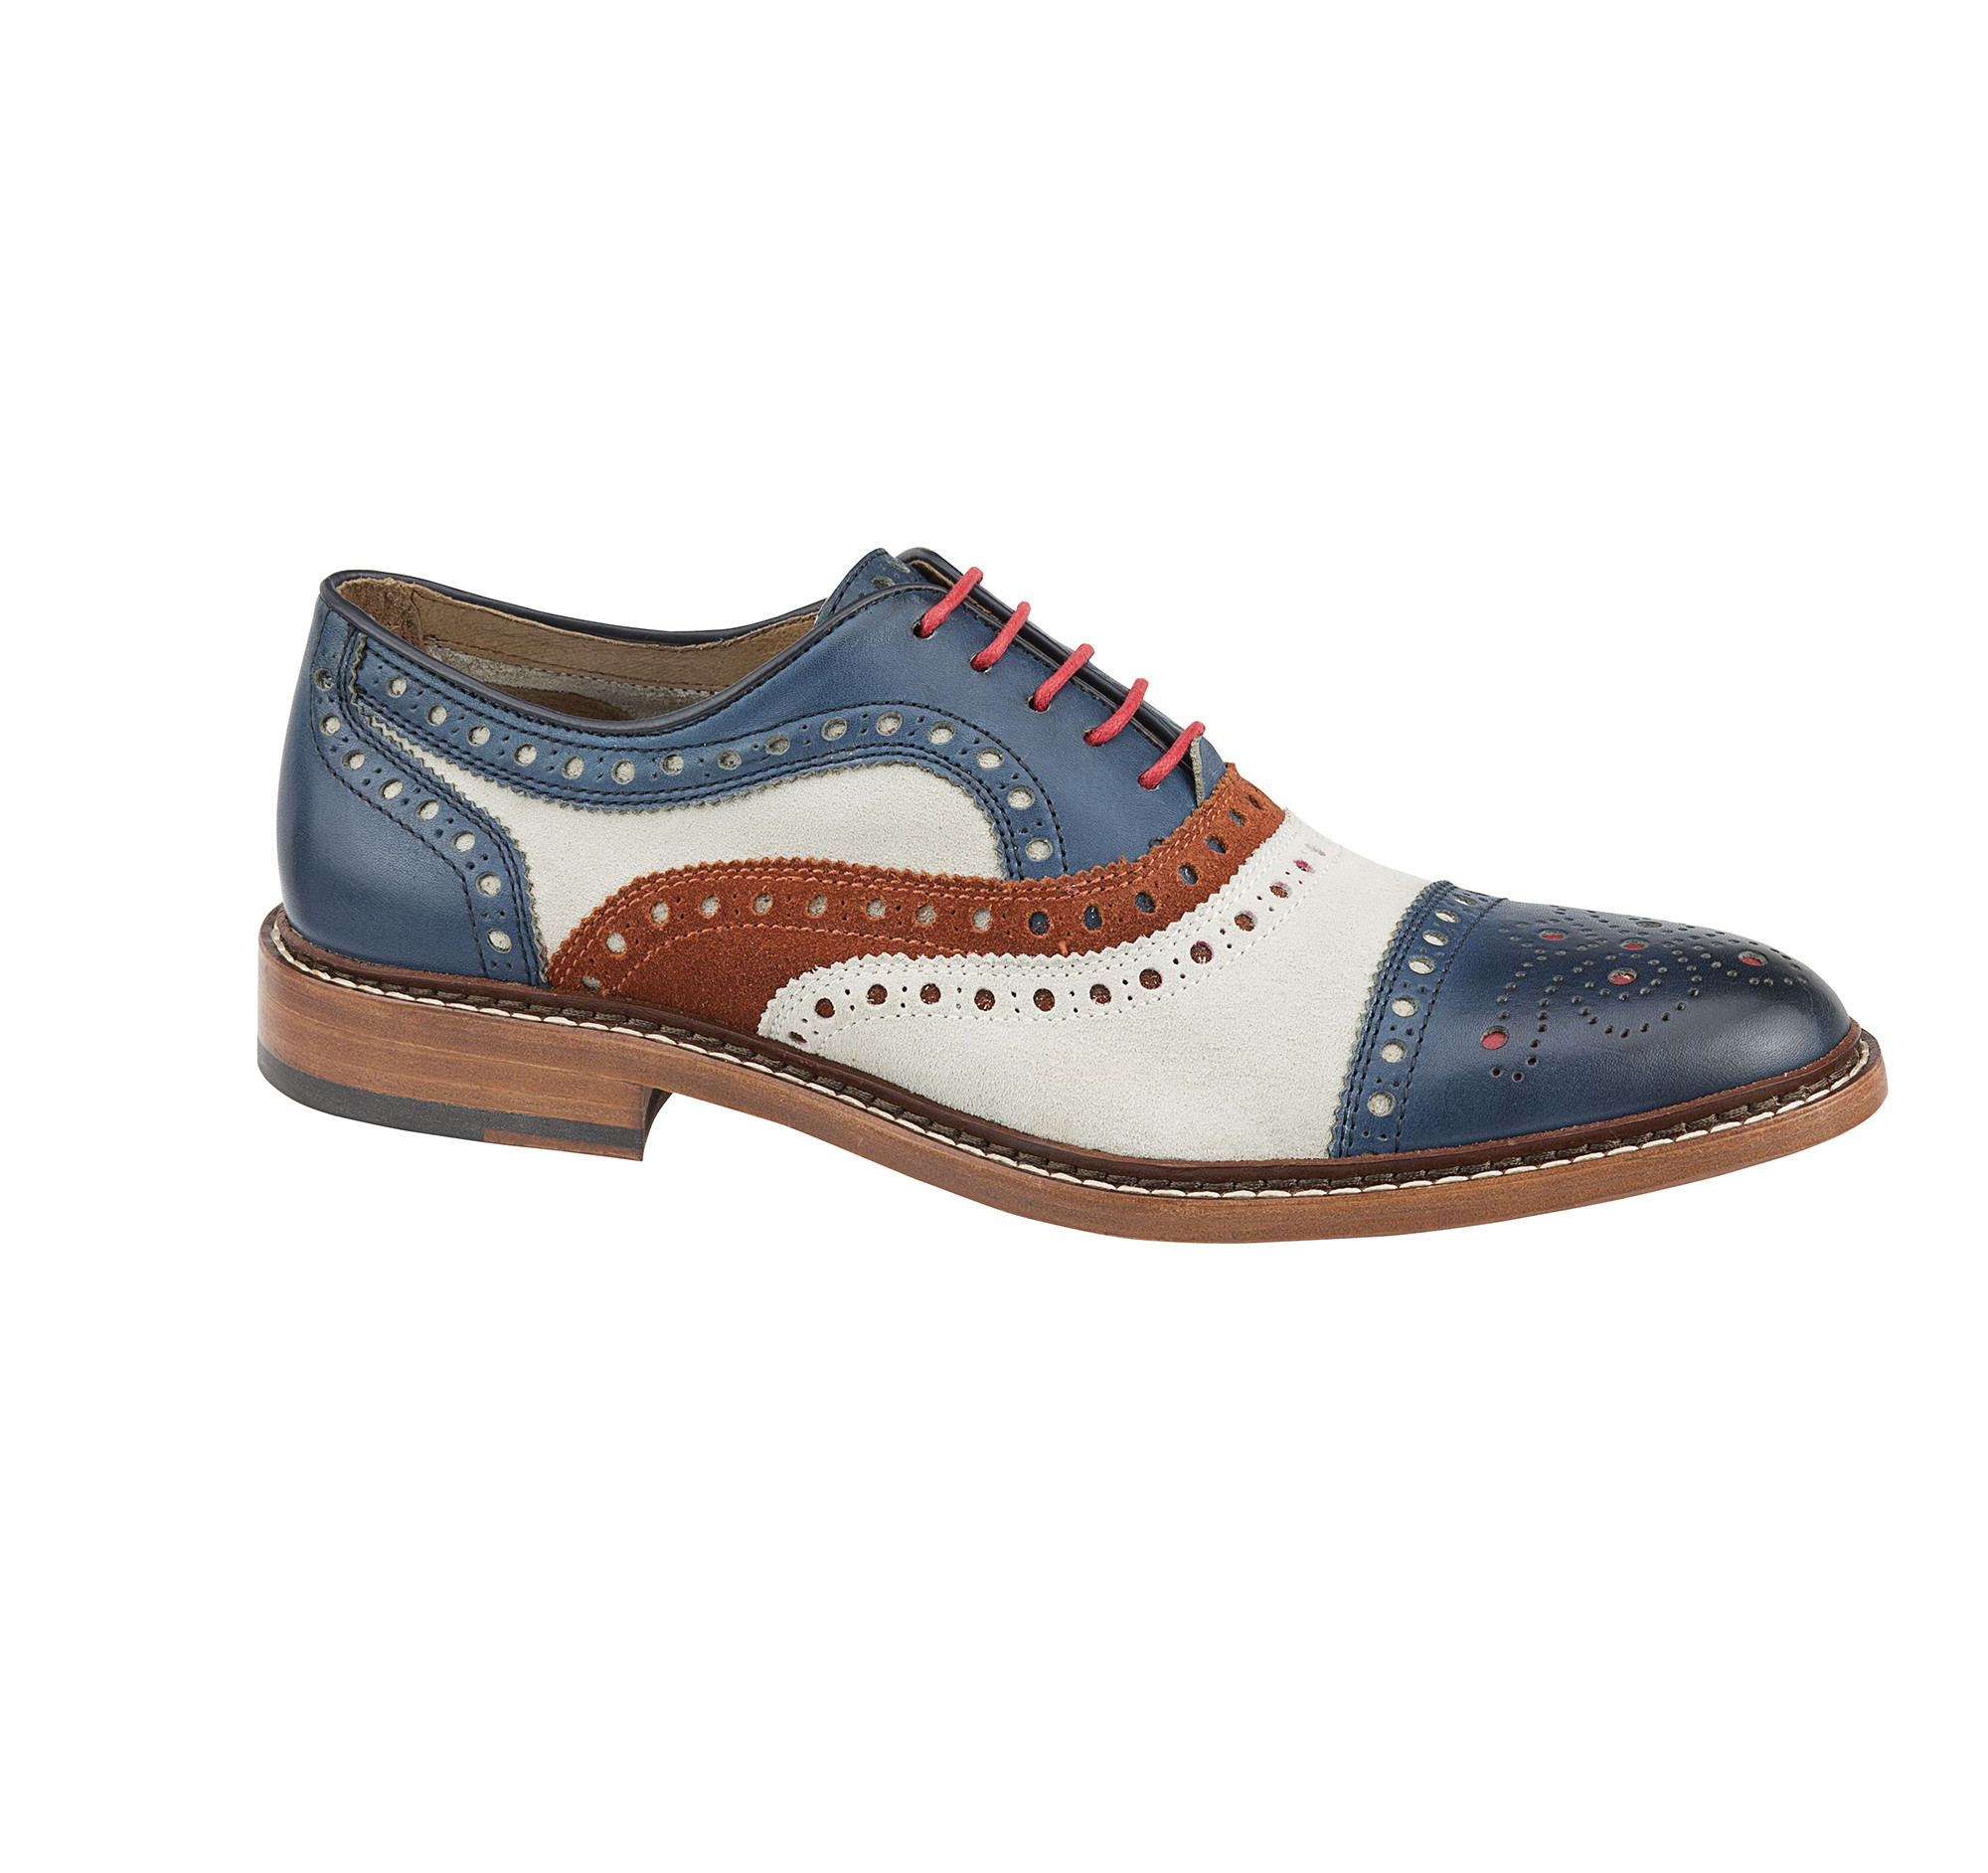 White Cap Toe Shoes